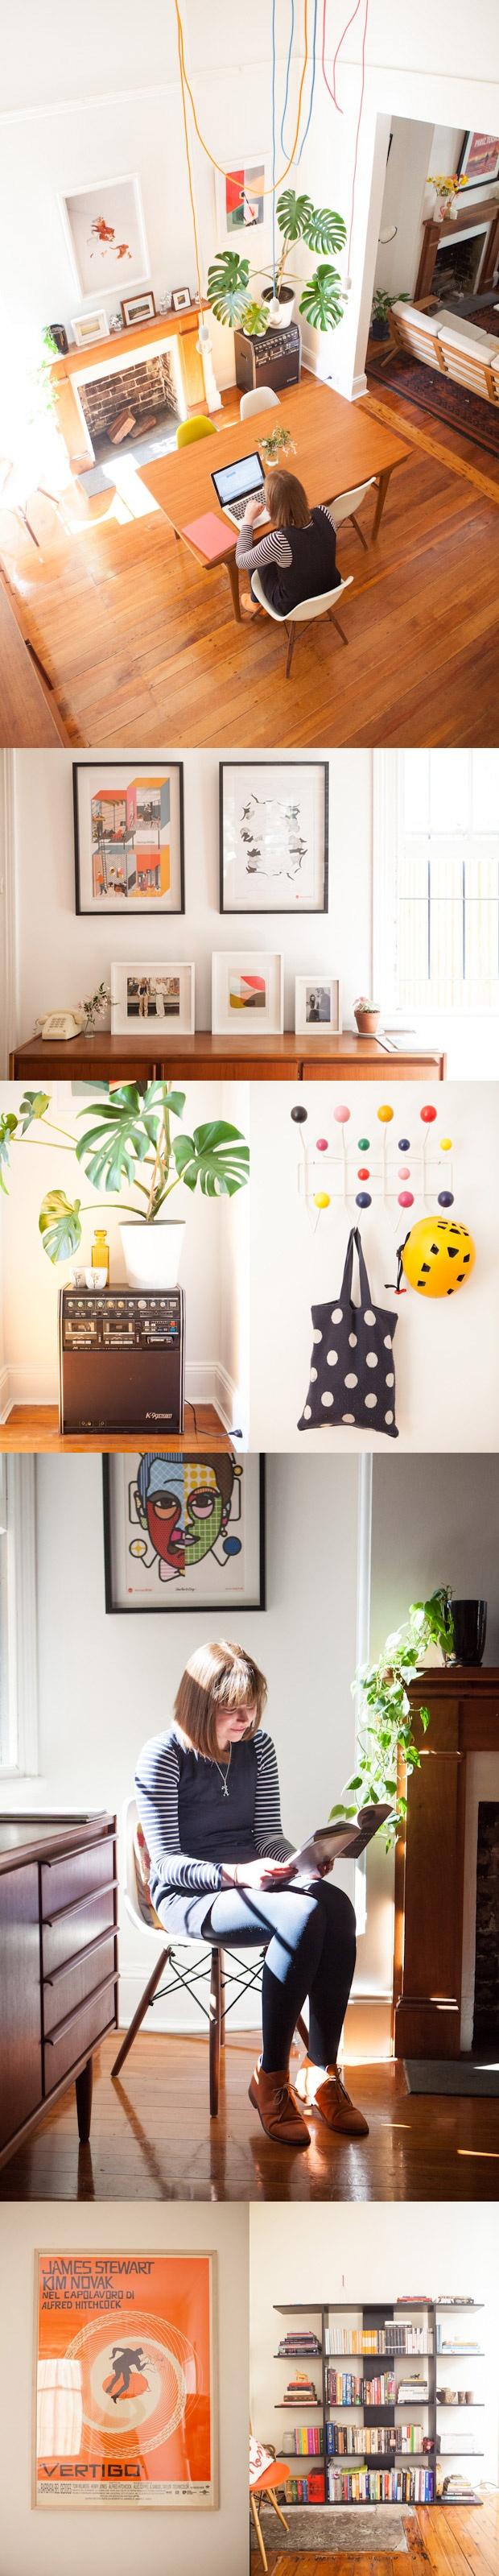 Homes interiors inspiration - Claire Yvonne Evans - Ashka interview #homes #interiors #inspirations #creative #sydney #australia #diningroom #livingroom #homeoffice #workspace #hanginglightbulbs #fireplace #prints #art #midcentury #furnitures #vintage #bookshelf